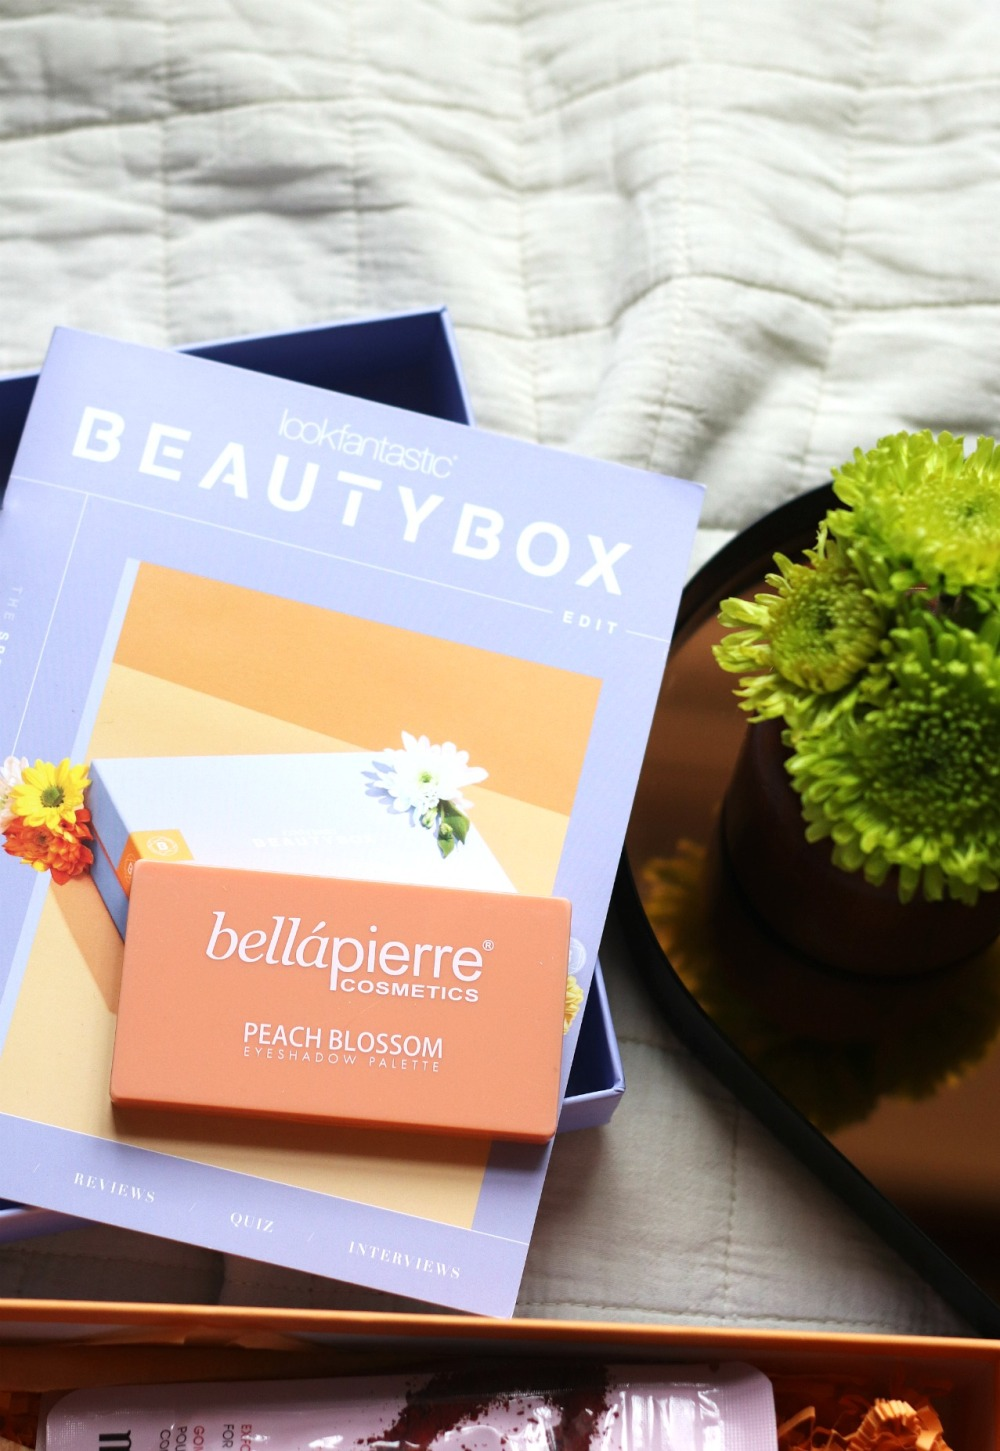 Lookfantastic April 2020 Bellapierre Peach Blossom Eyeshadow Palette